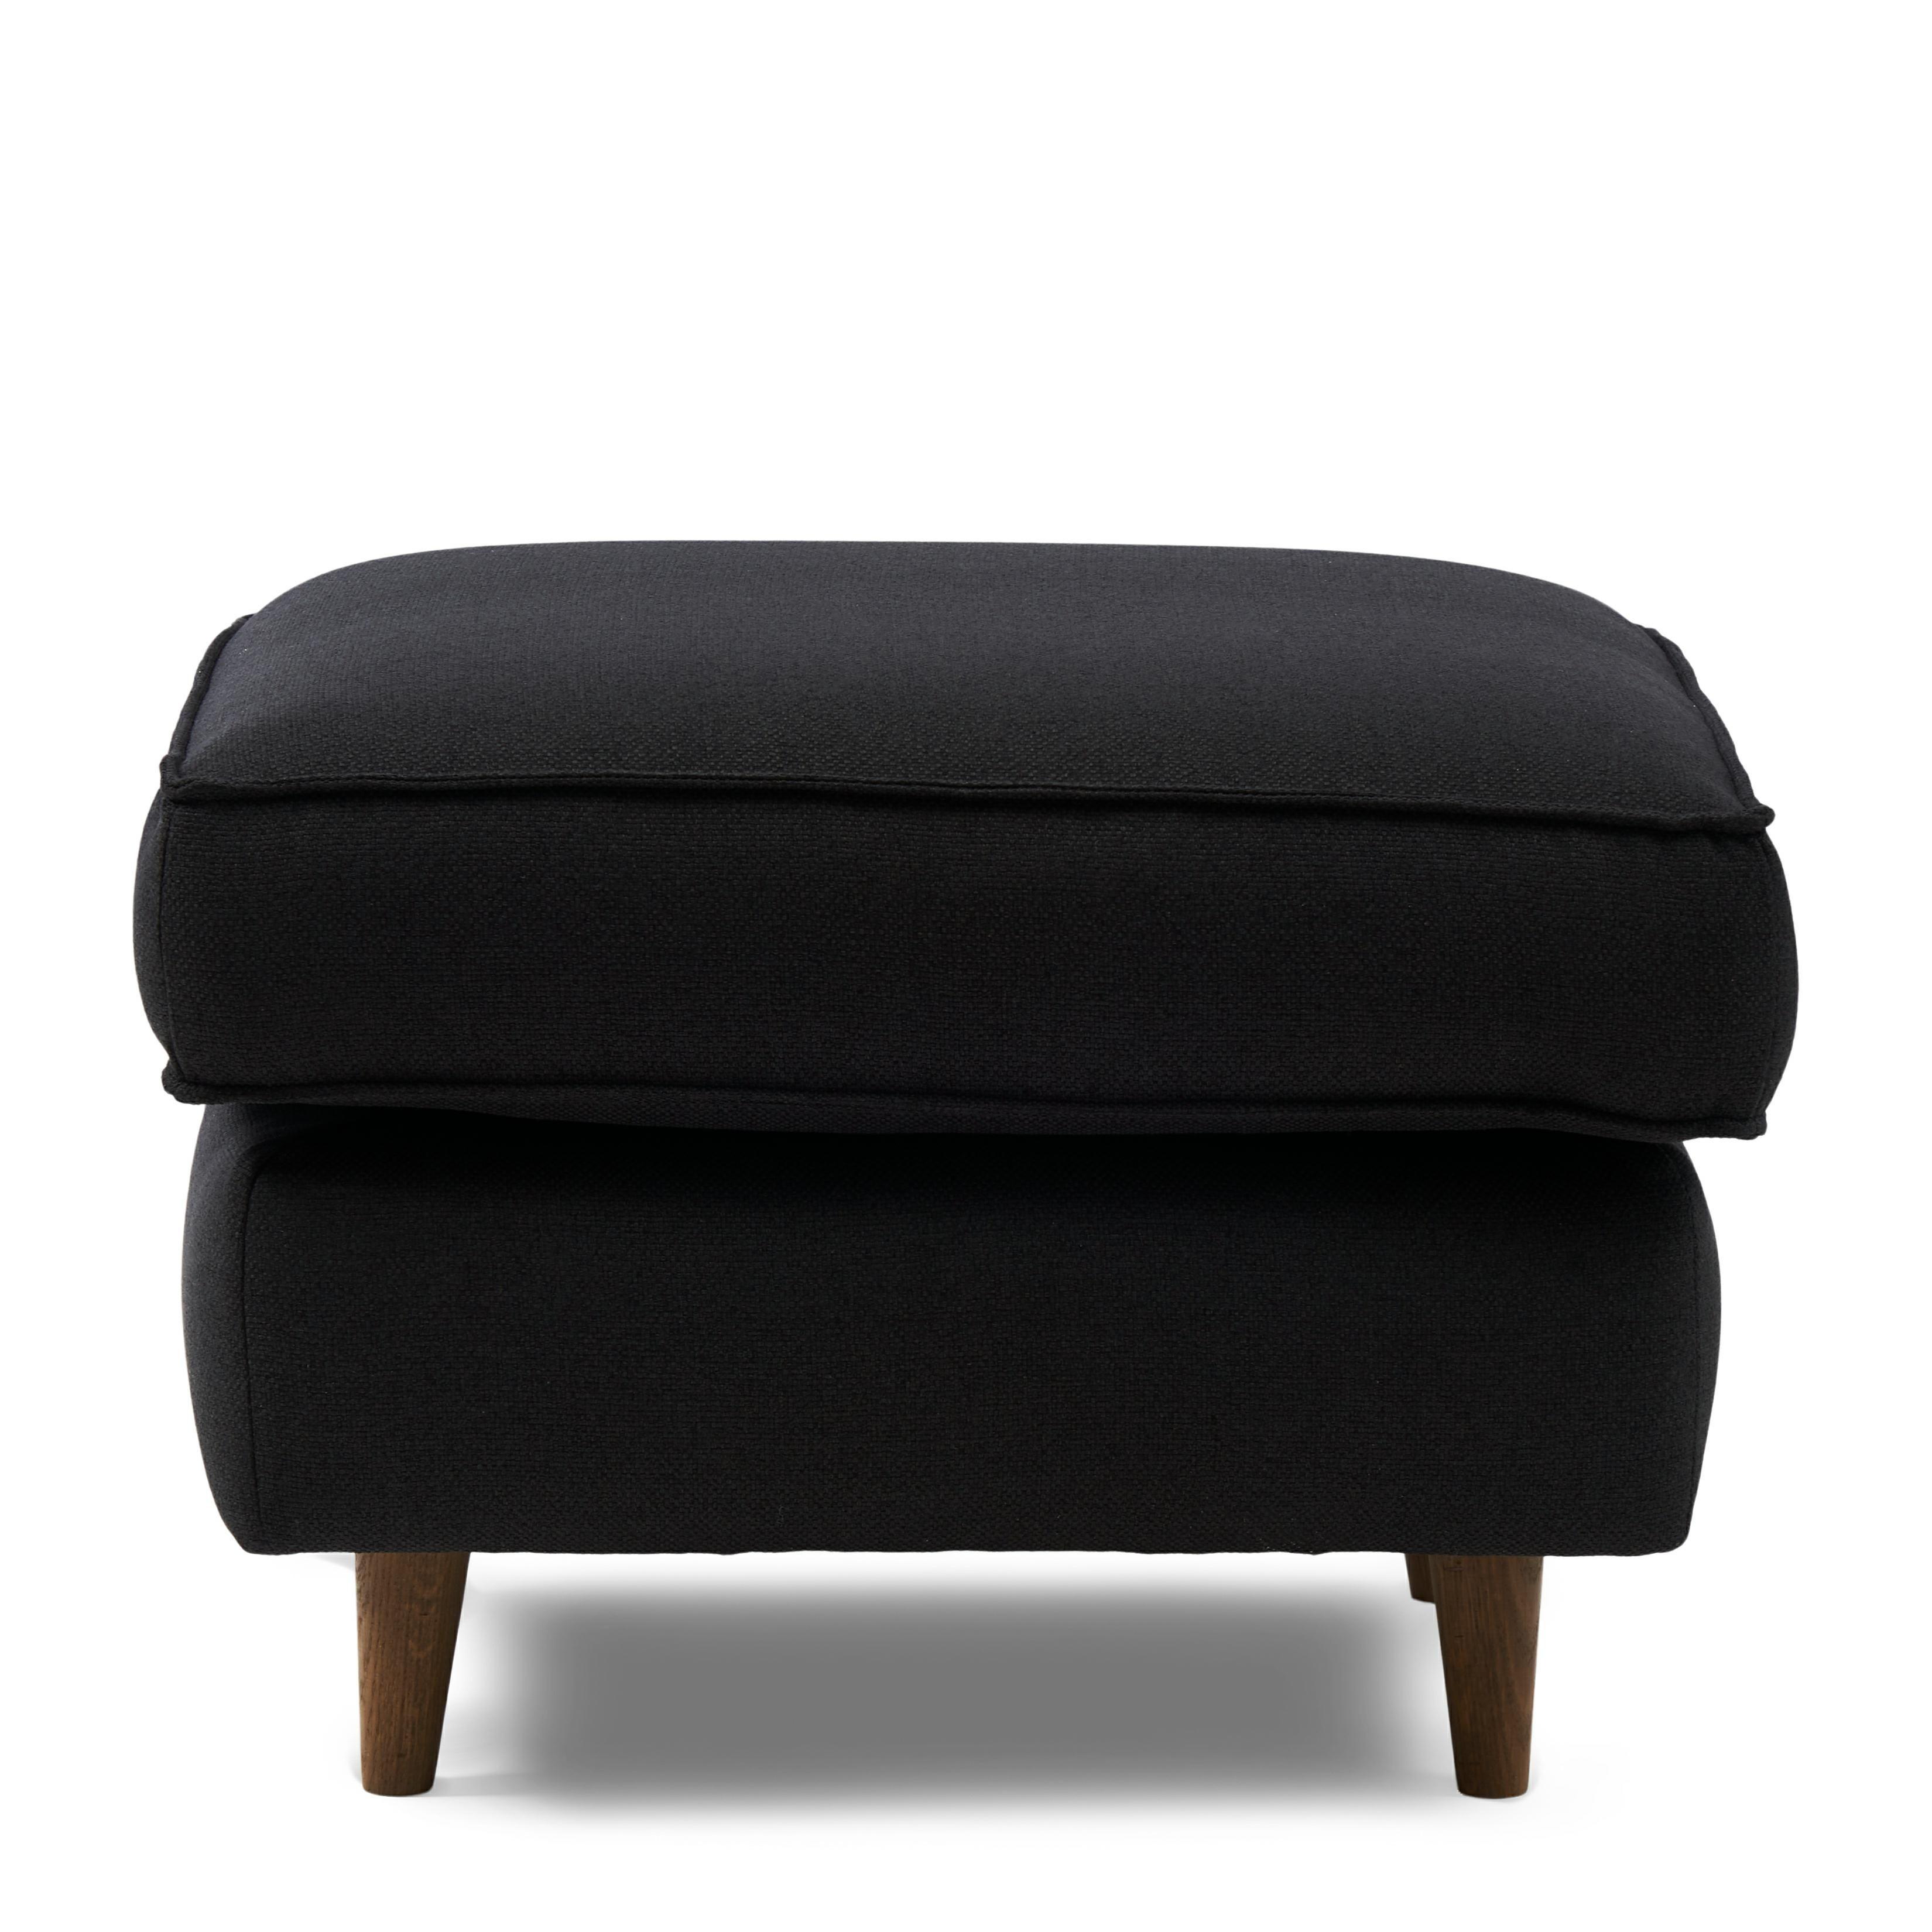 Kendall Hocker 70x70 oxford weave basic black / Rivièra Maison